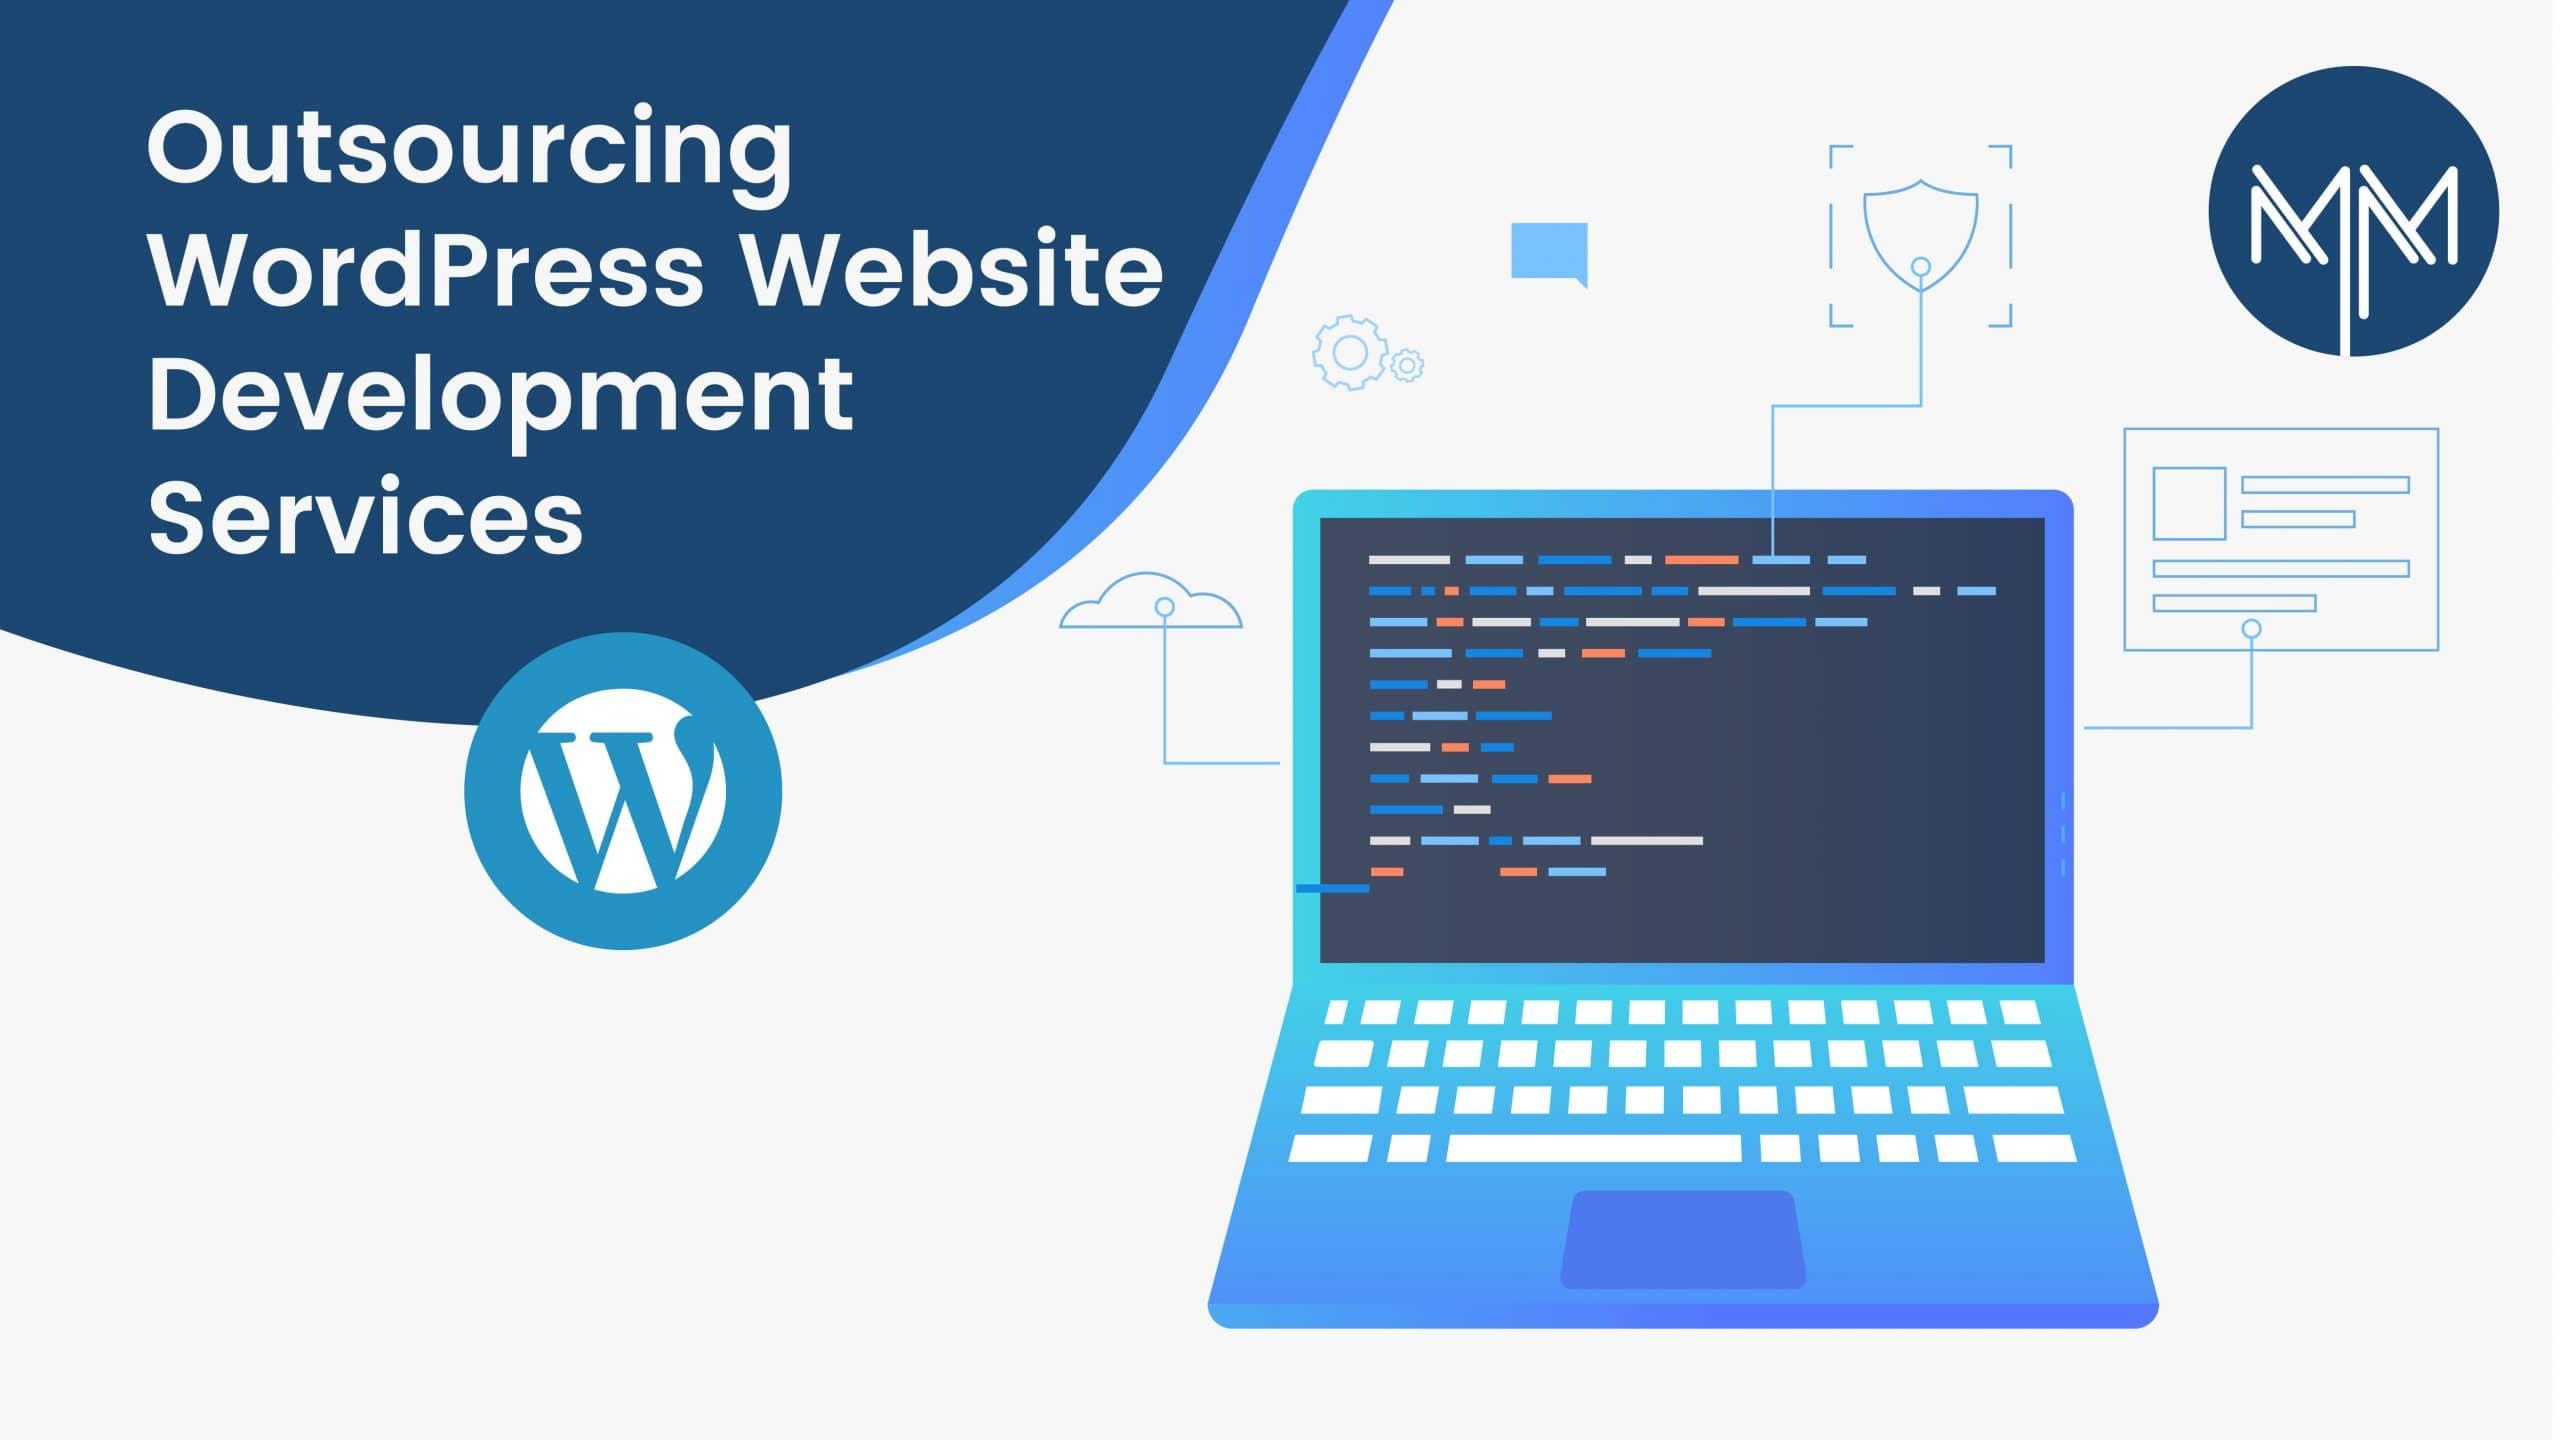 Outsourcing WordPress Website Development Services